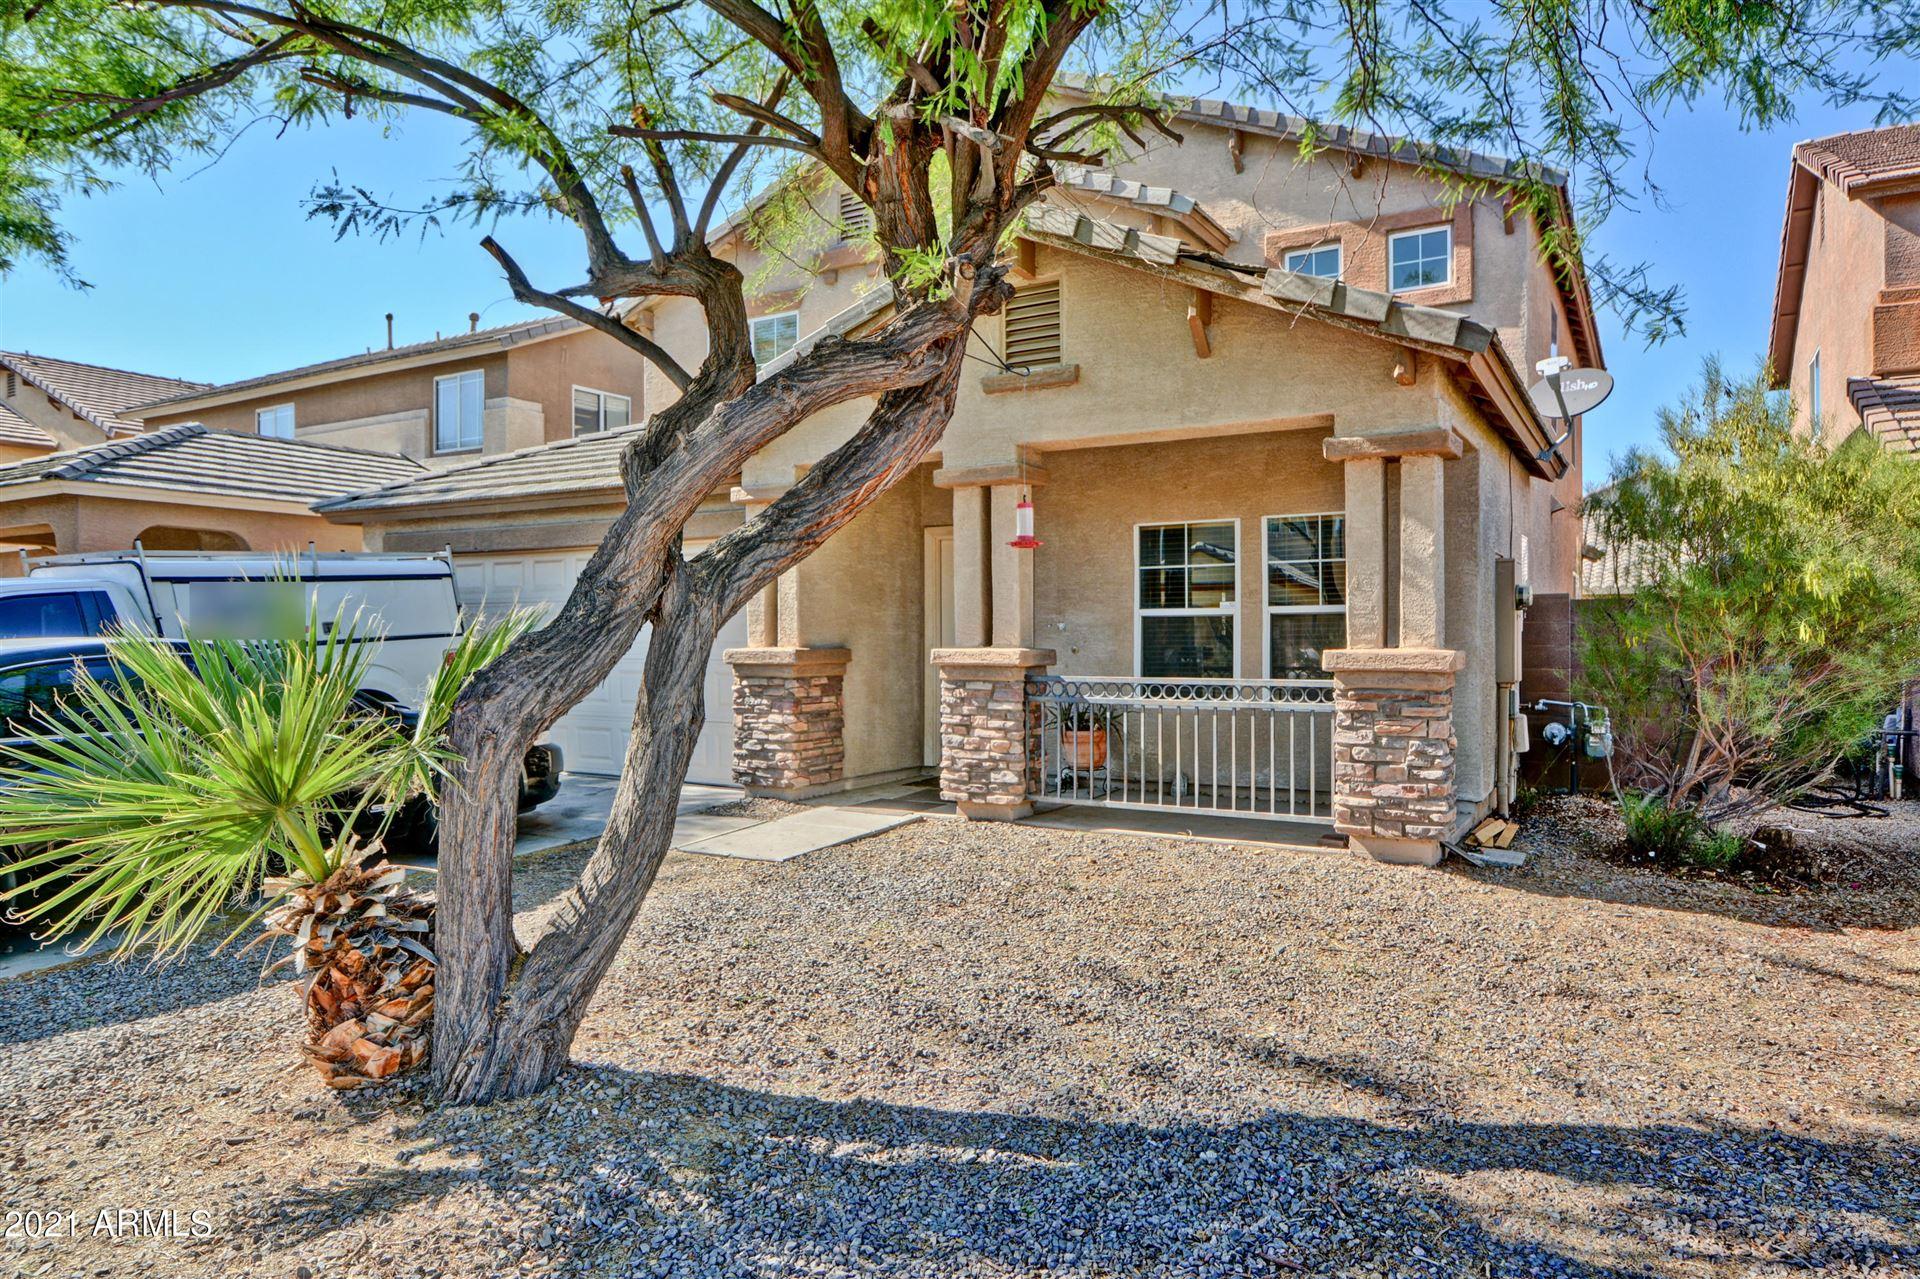 7242 W CROWN KING Road, Phoenix, AZ 85043 - MLS#: 6231731